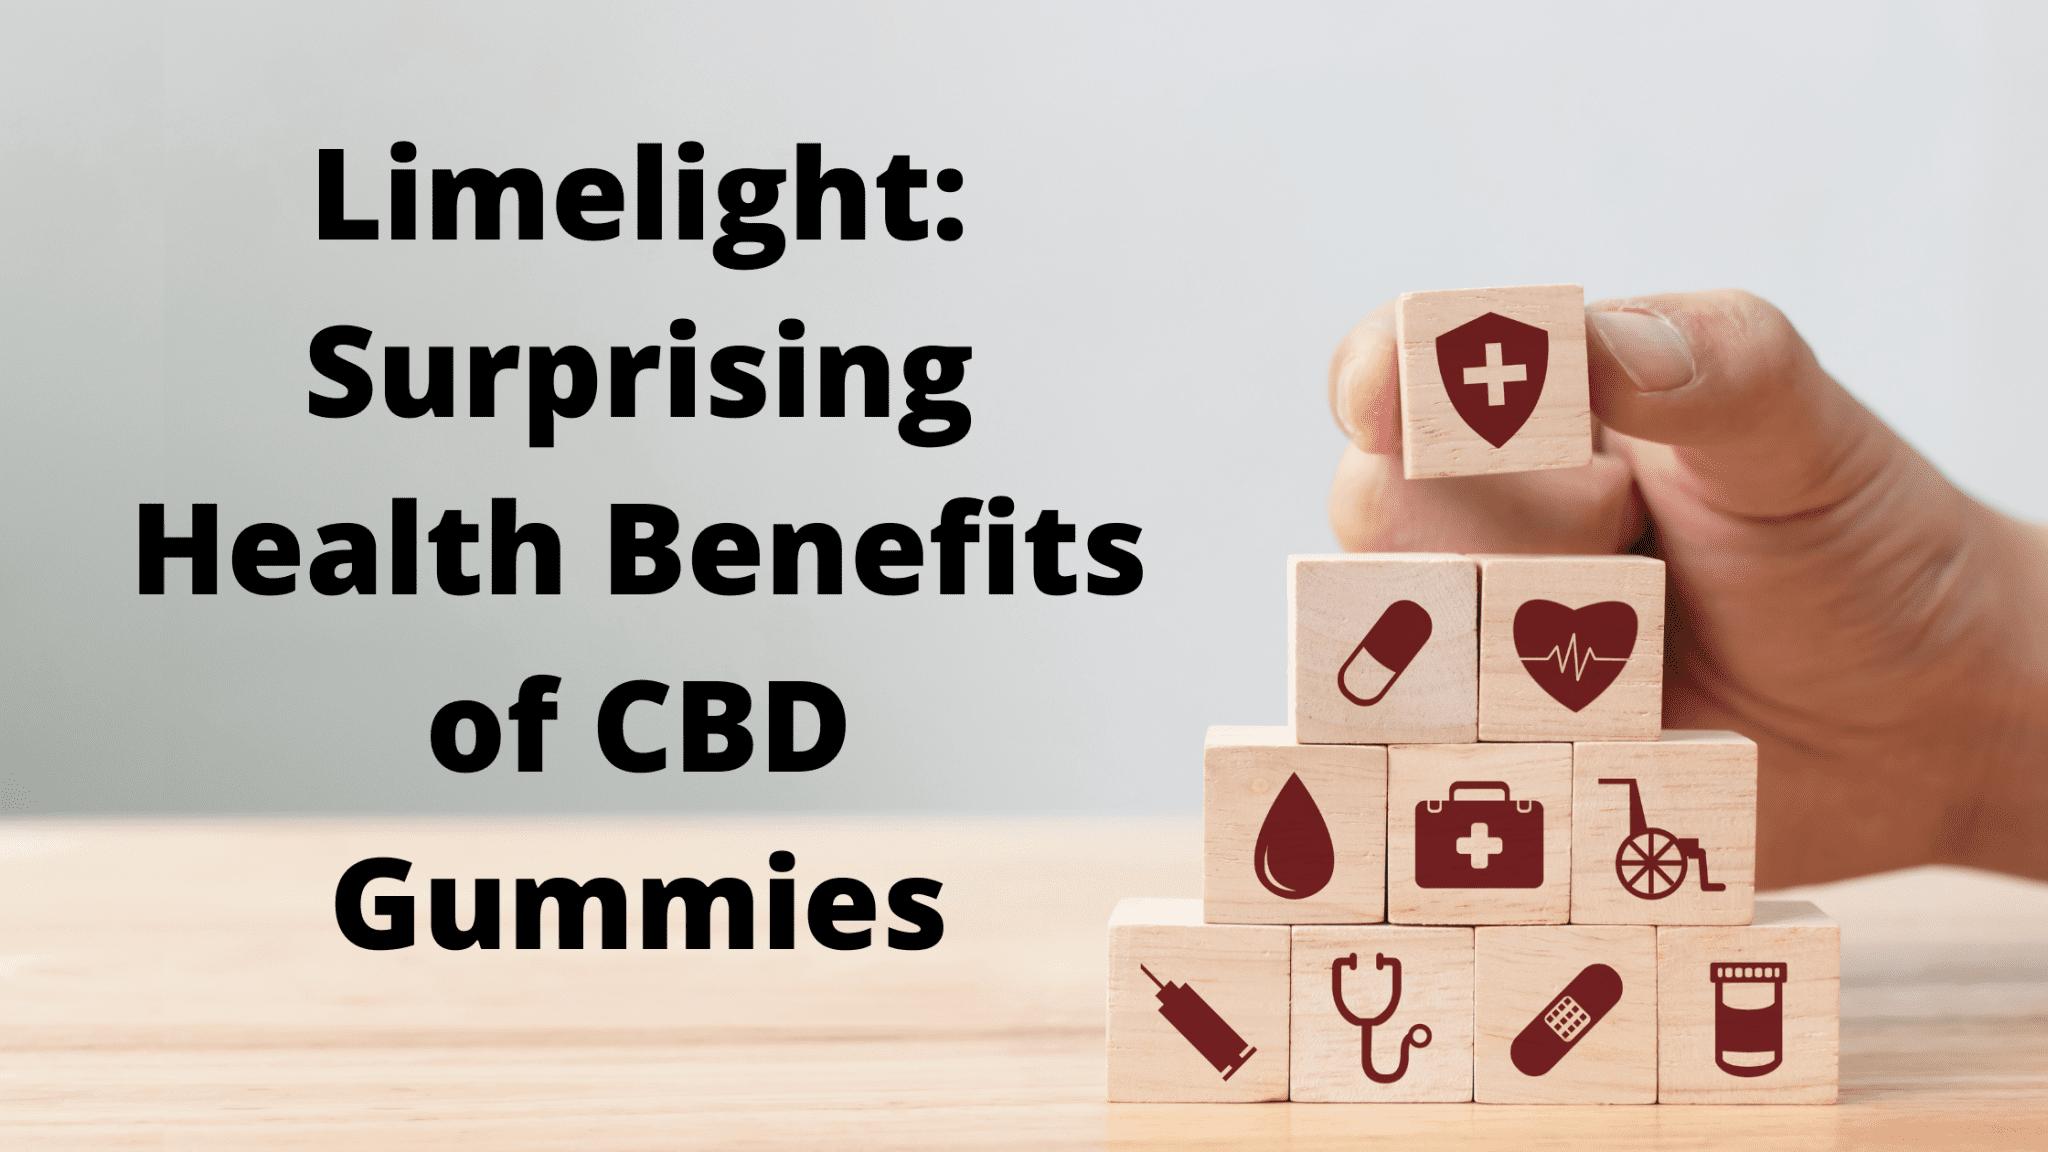 Limelight_ Surprising Health Benefits of CBD Gummies